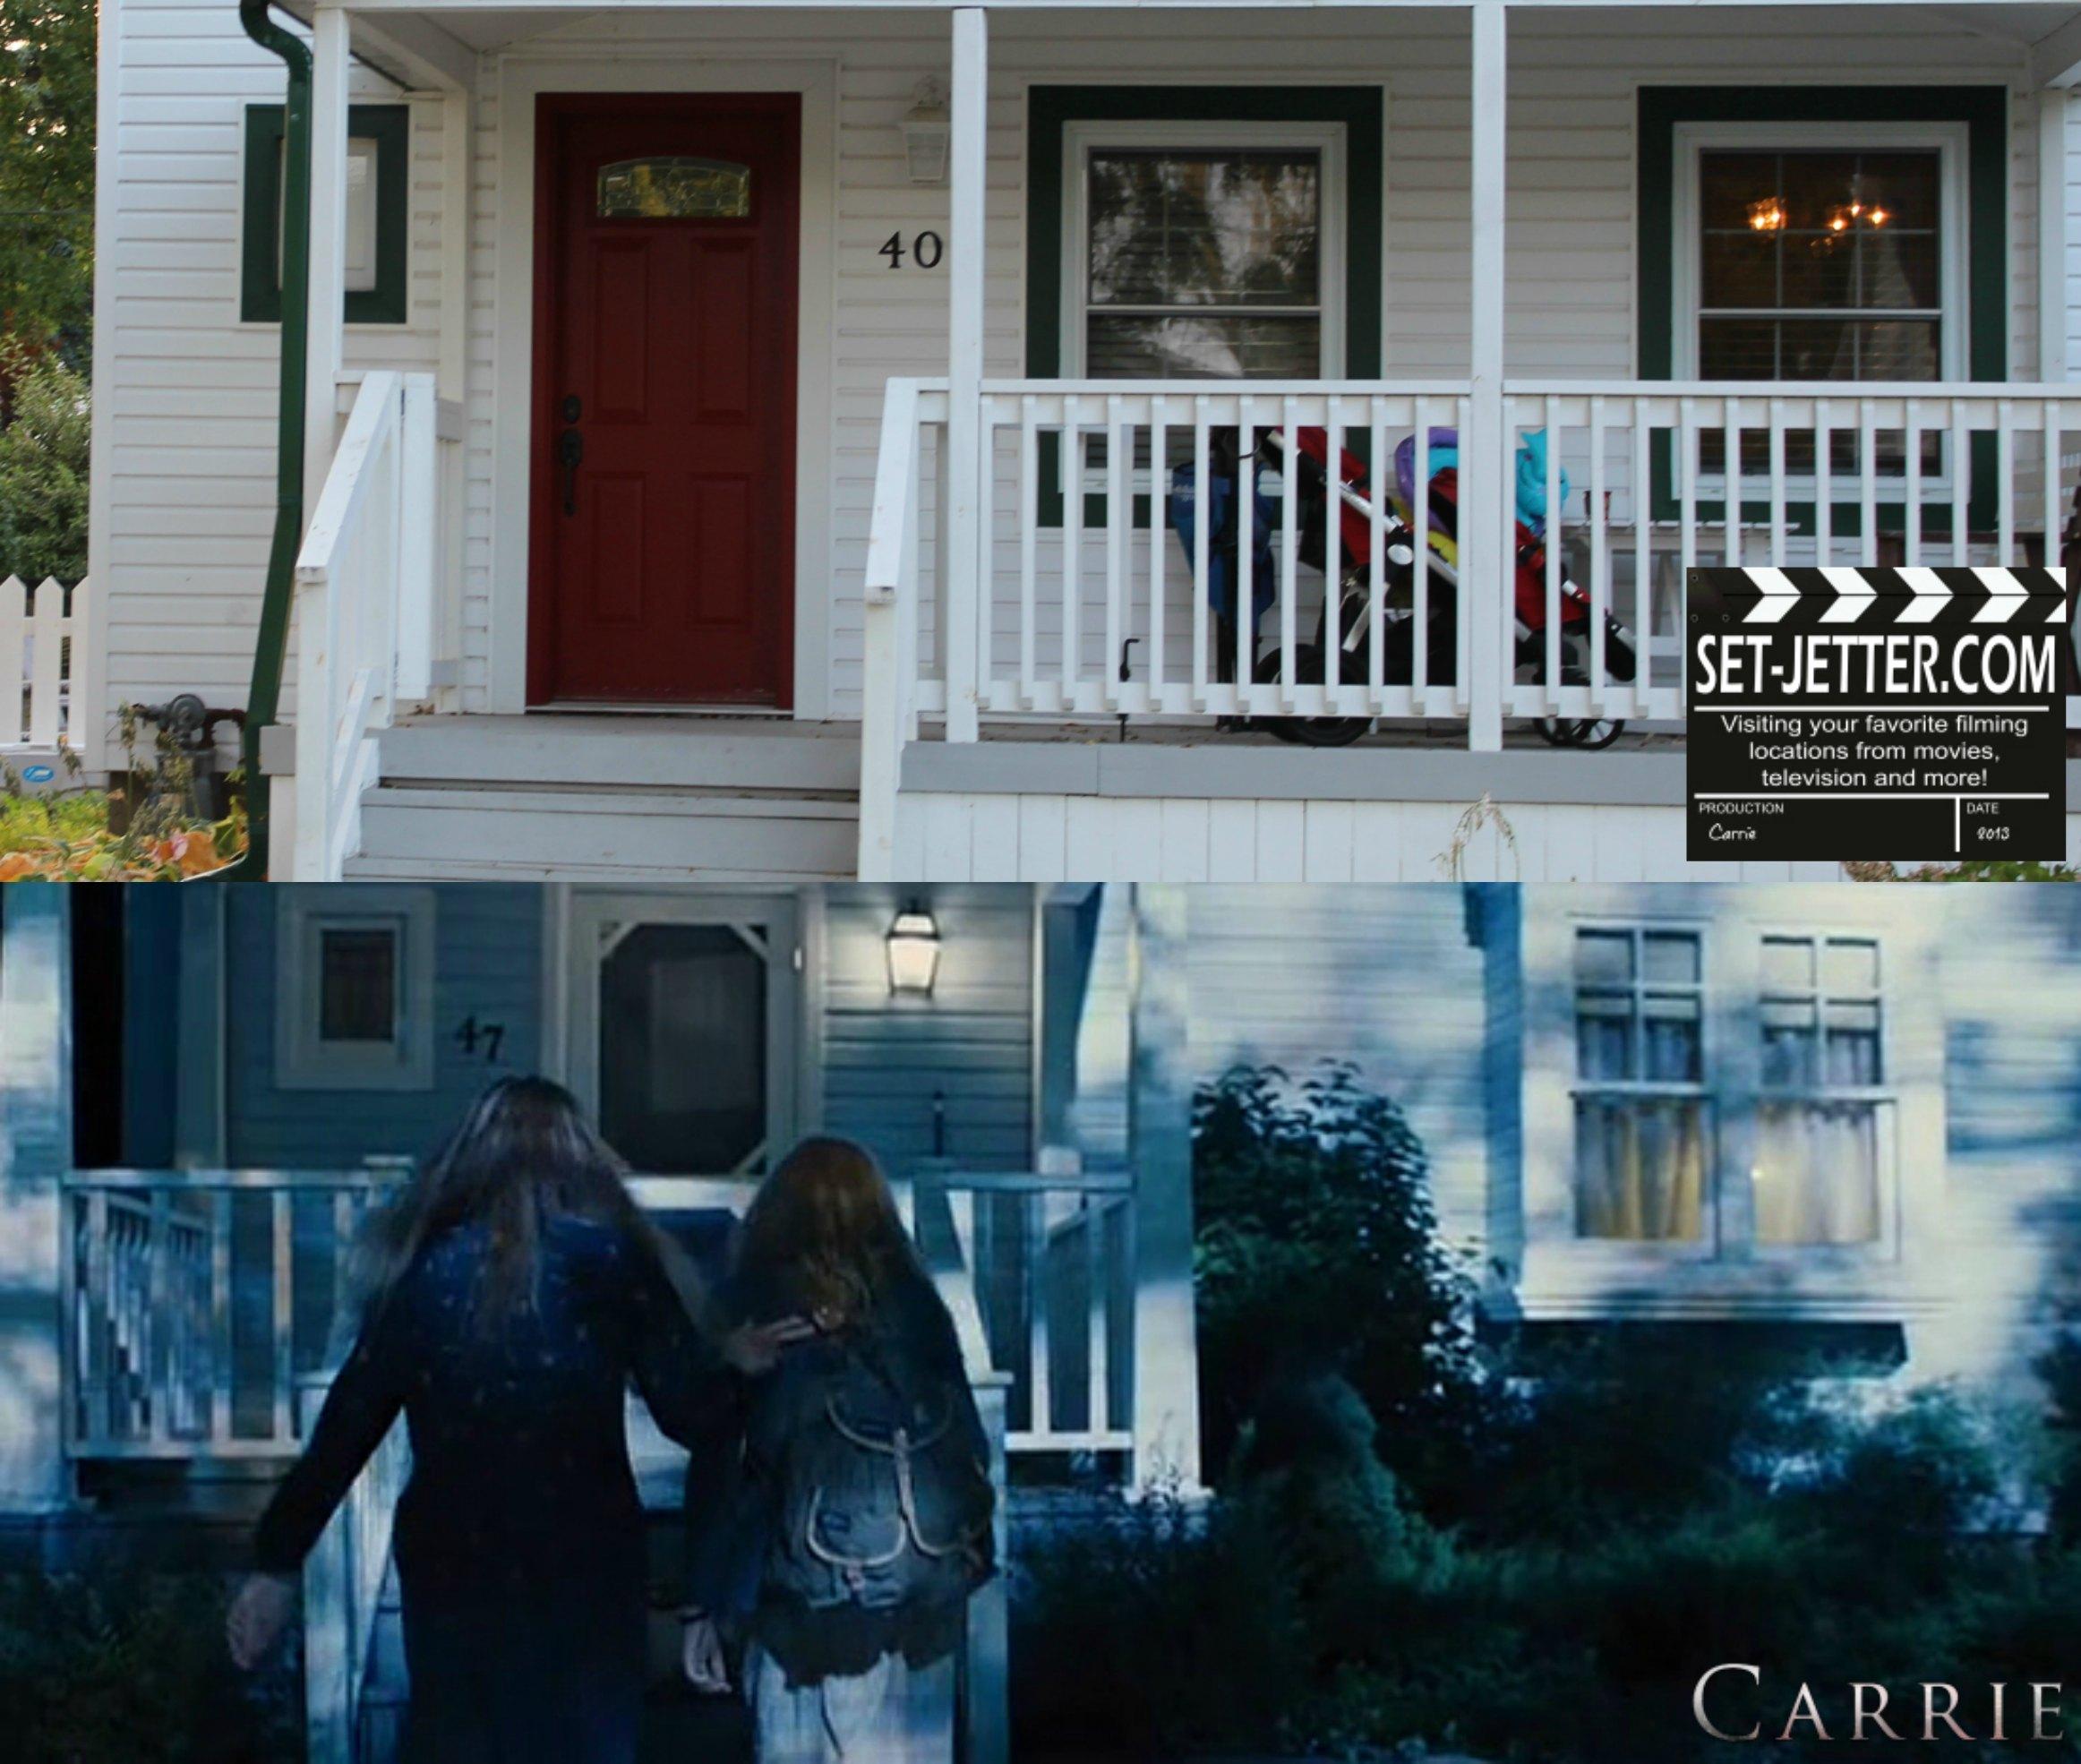 Carrie 2013 comparison 39.jpg